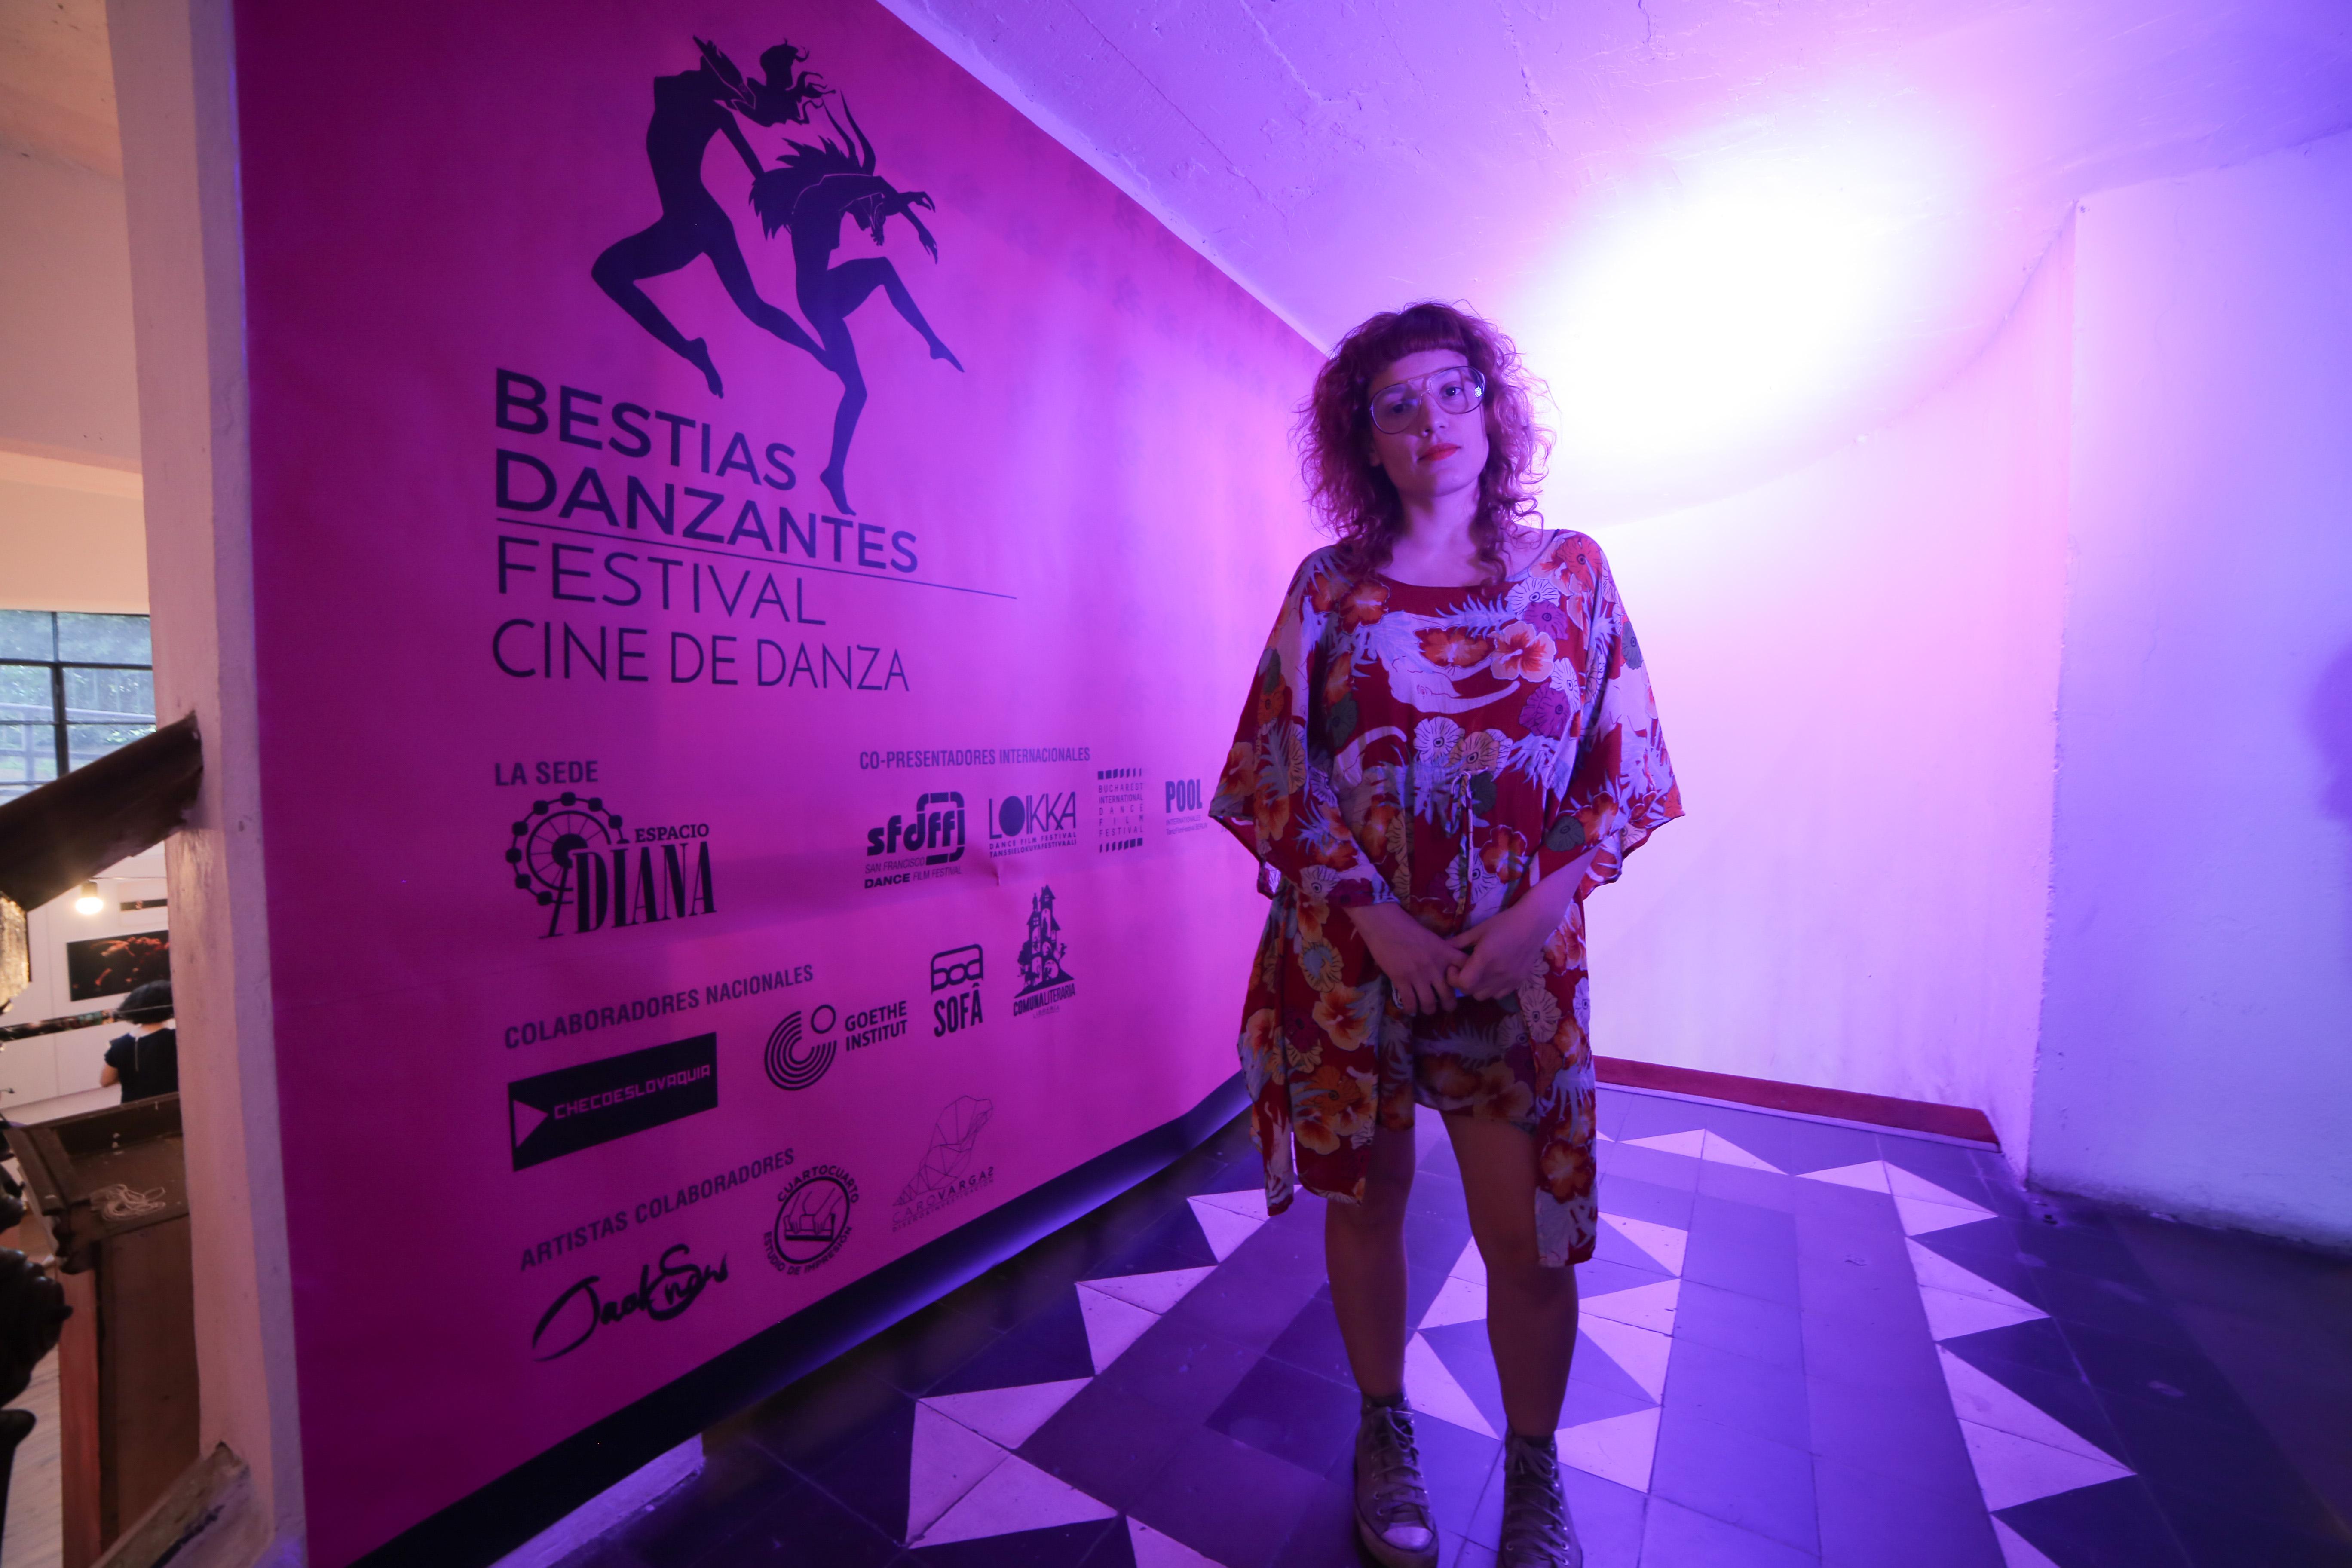 Bestias Danzantes 2017